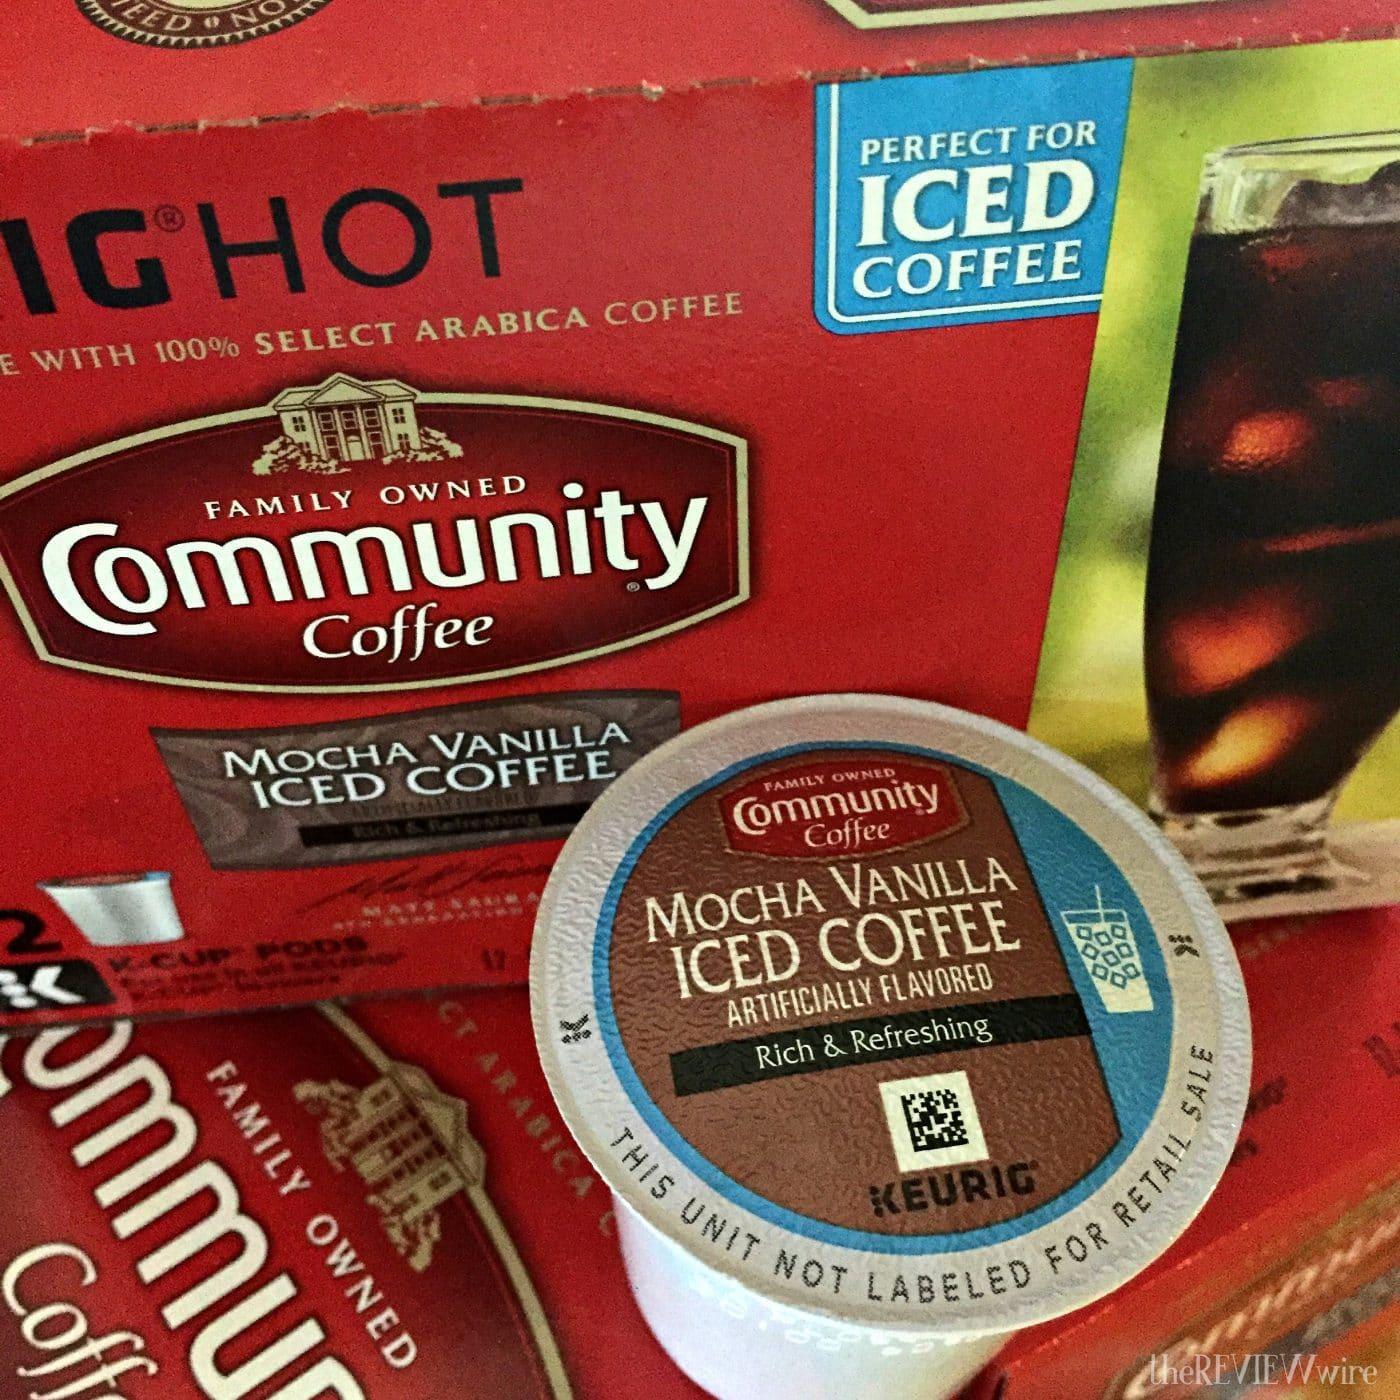 Mocha Vanilla Iced Coffee K-Cups from Community Coffee Co.